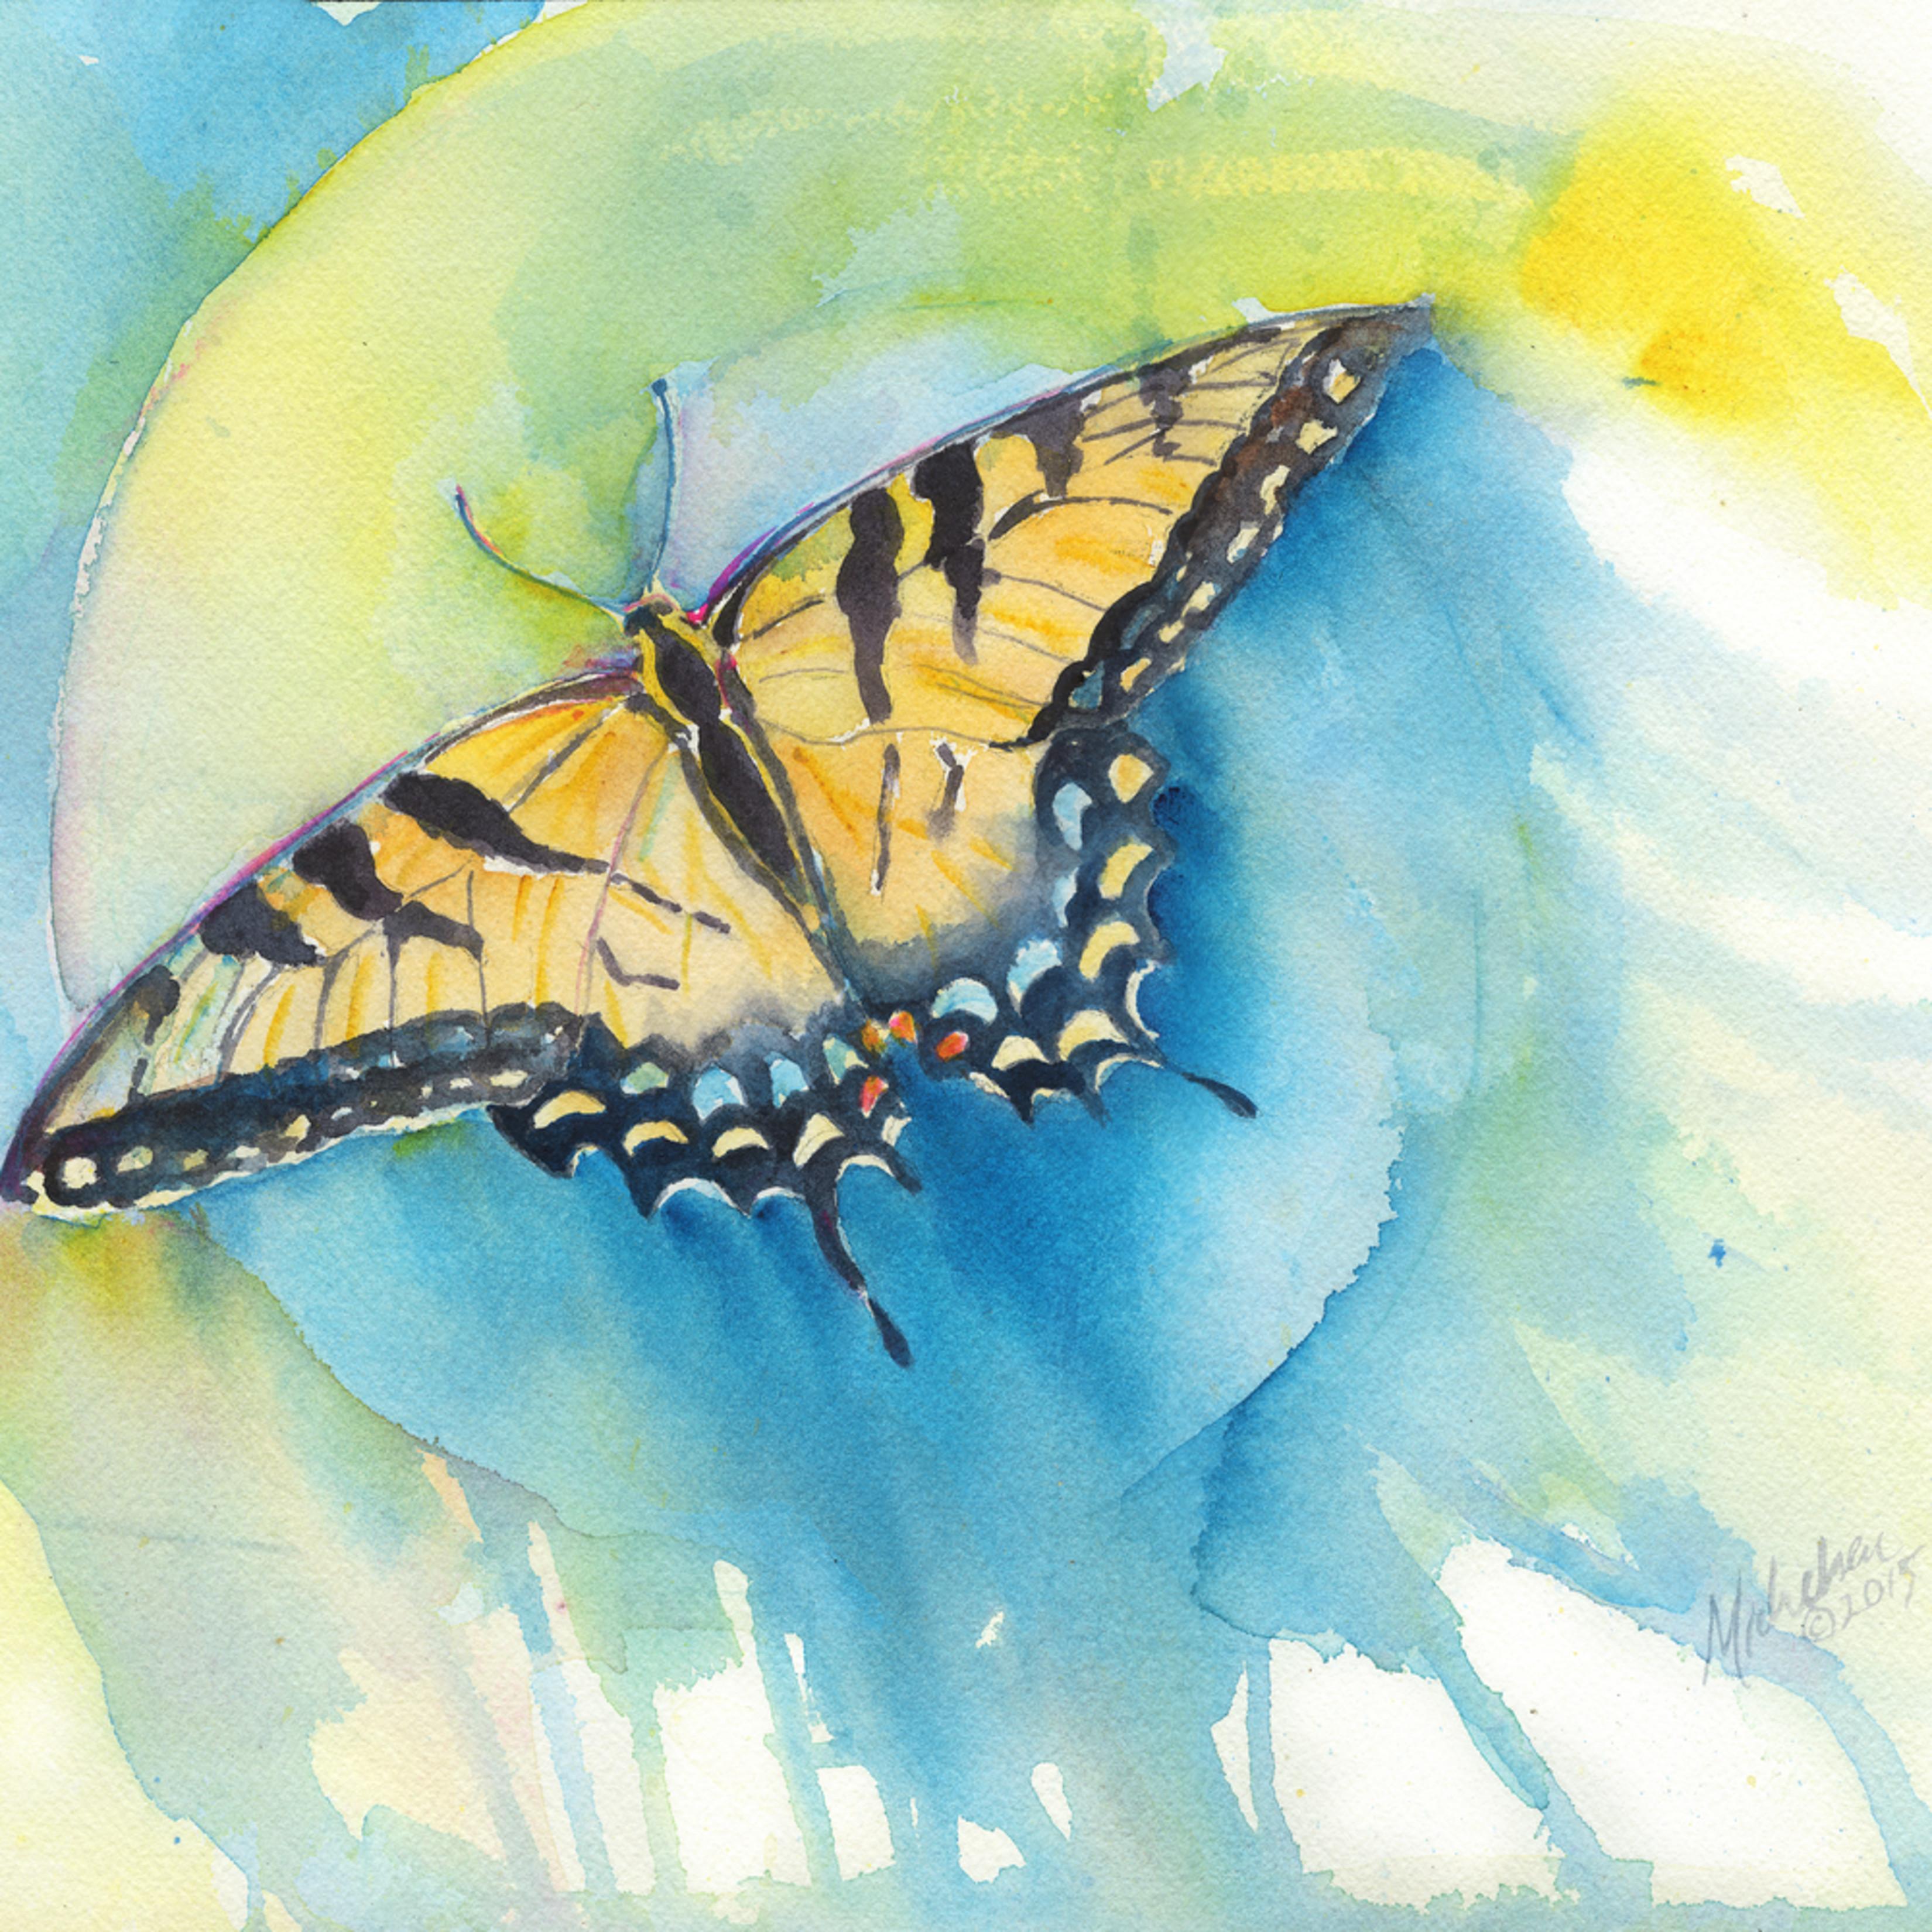 Mickelson butterfly final occlae